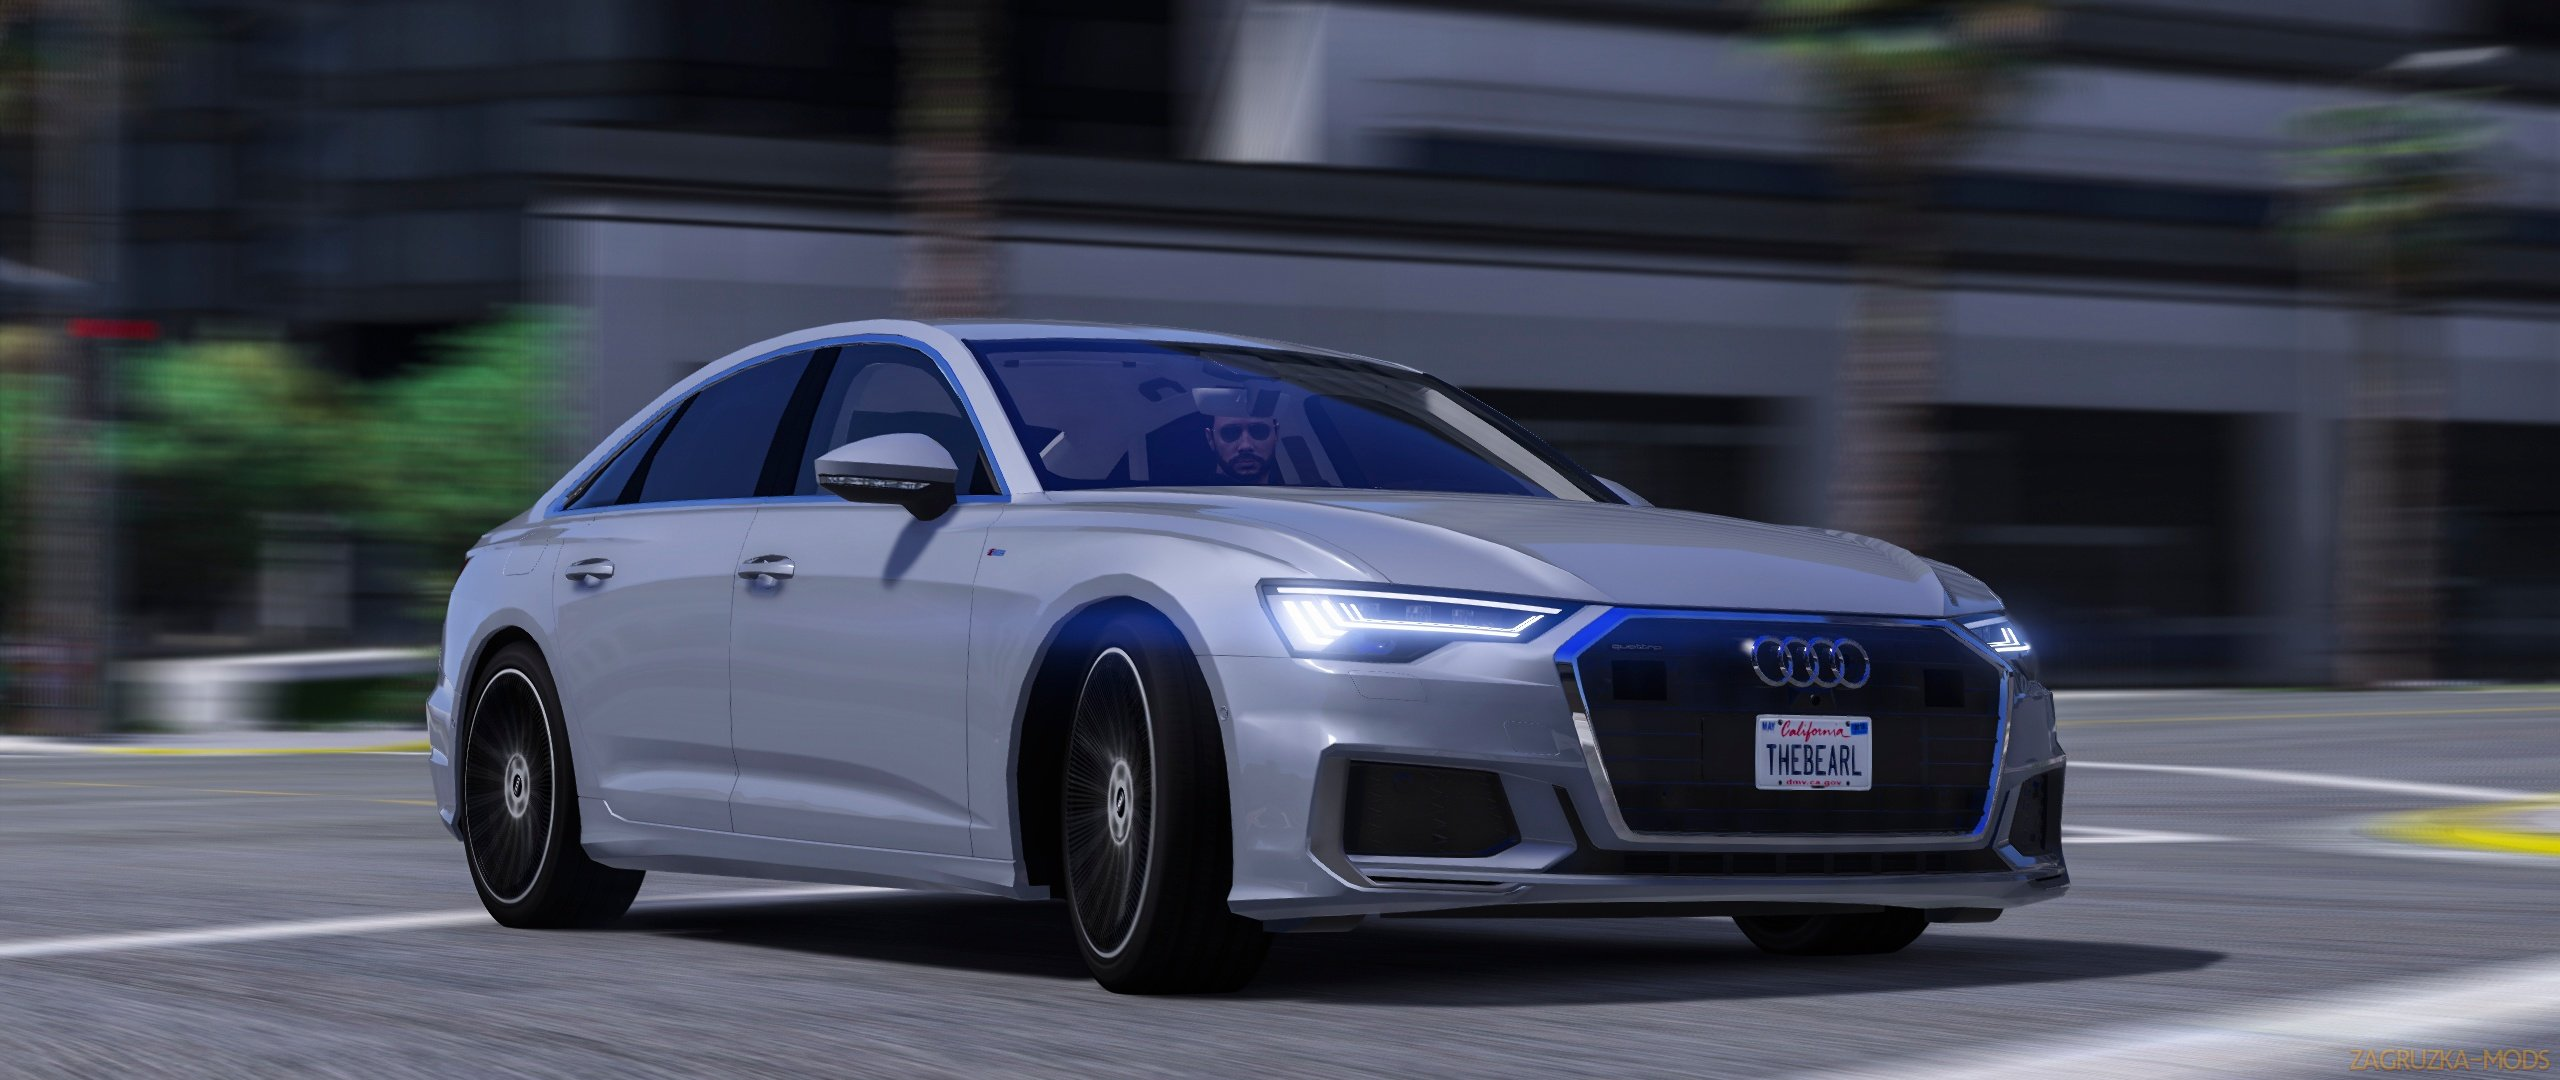 Audi Download Simulator Mods Ets2 Ats Fs17 Csgo